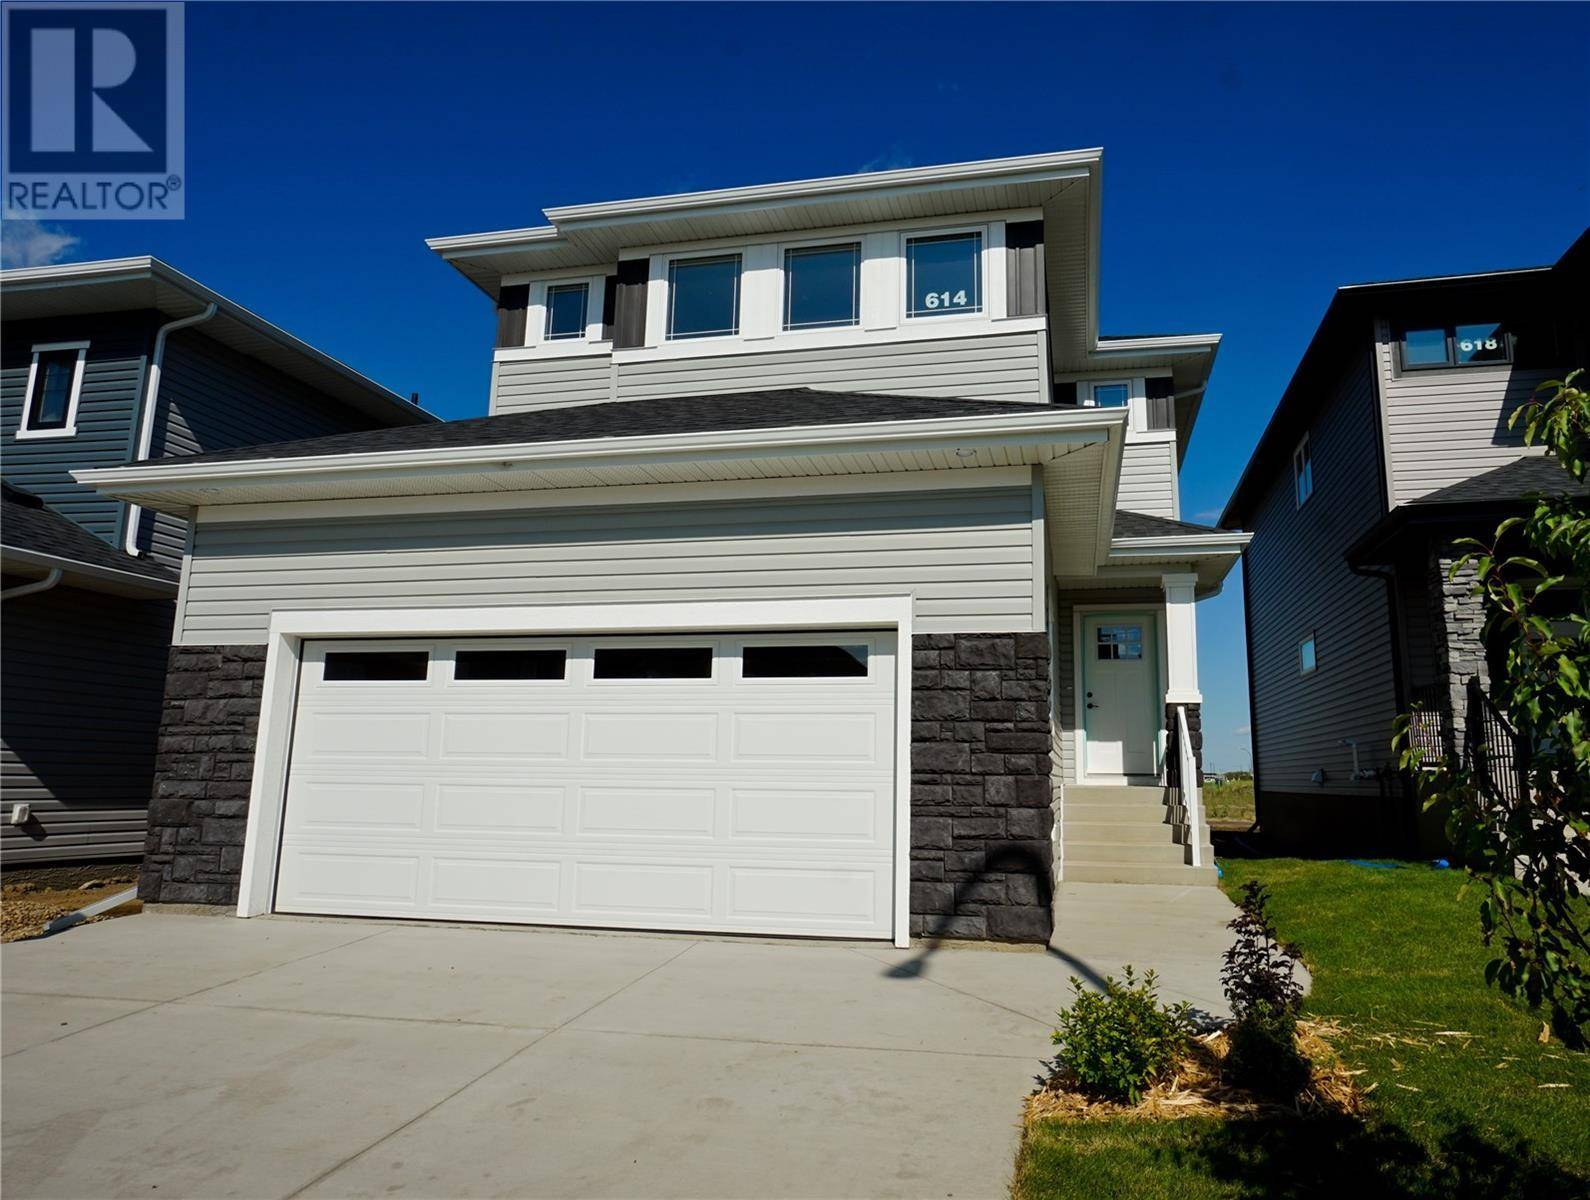 House for sale at 614 Mcfaull Cres Saskatoon Saskatchewan - MLS: SK774617